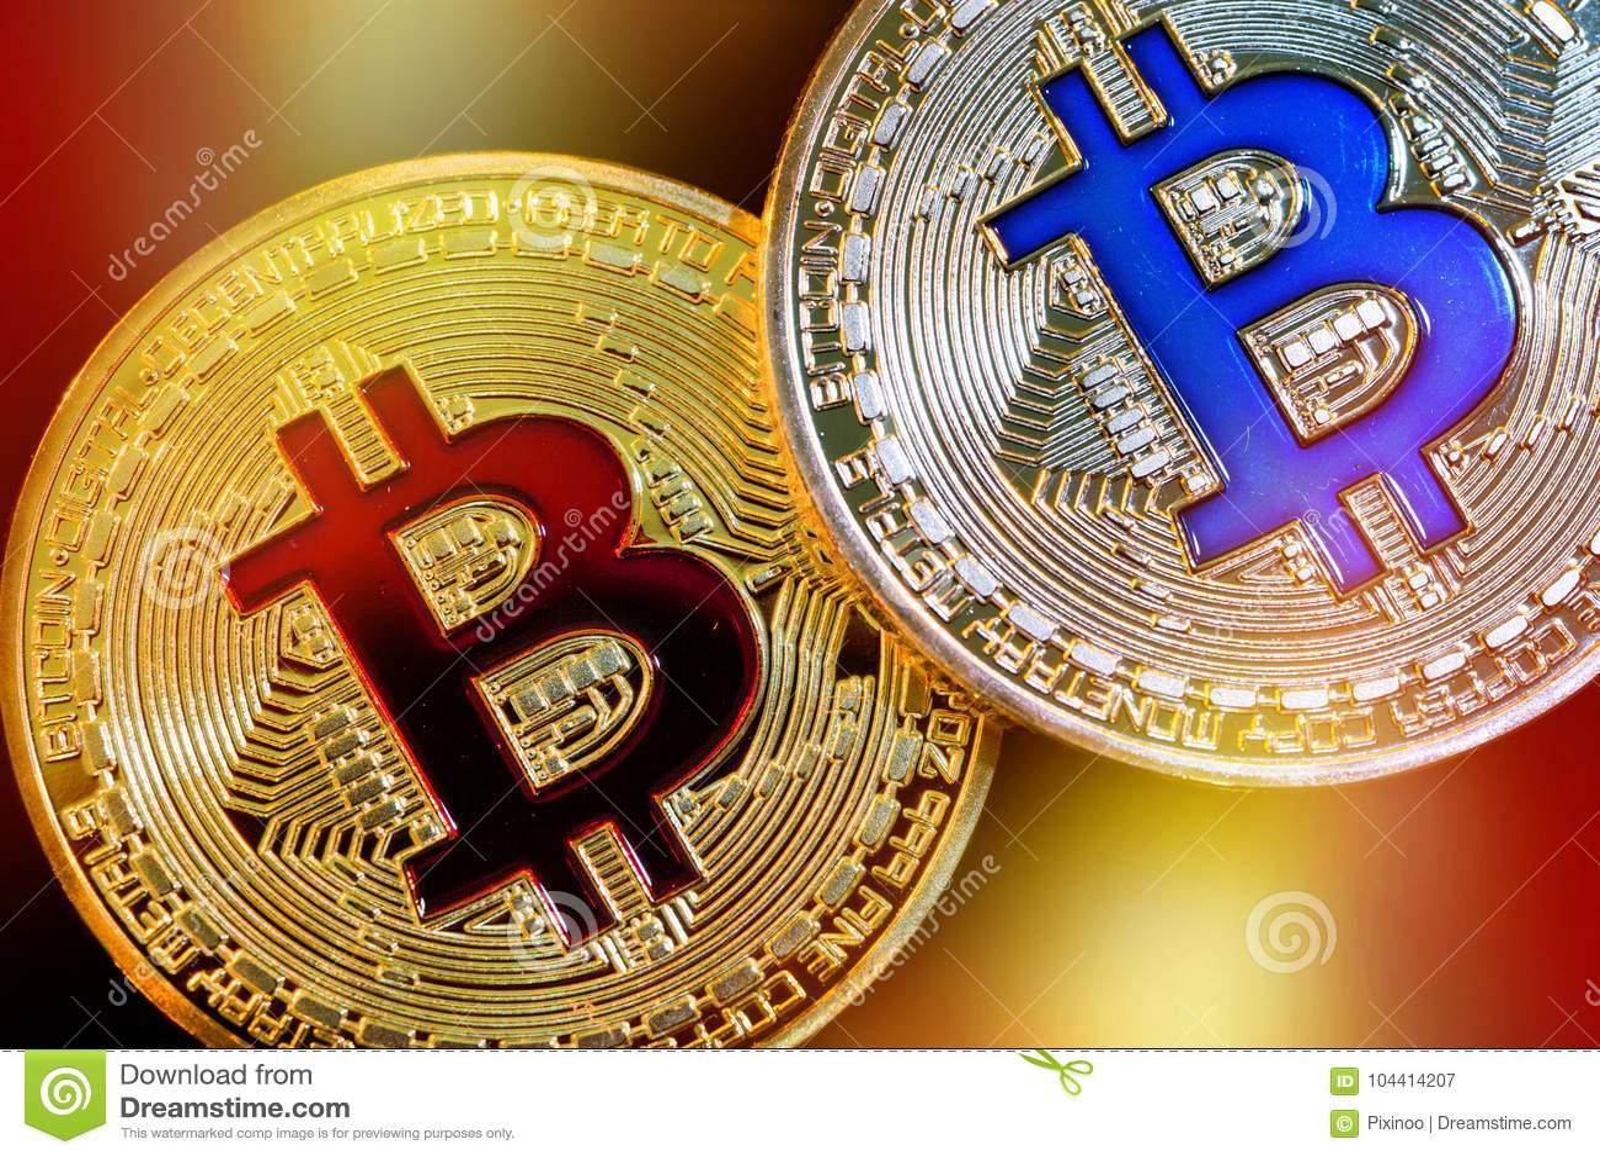 Virtueel geld bitcoins betting action reverse